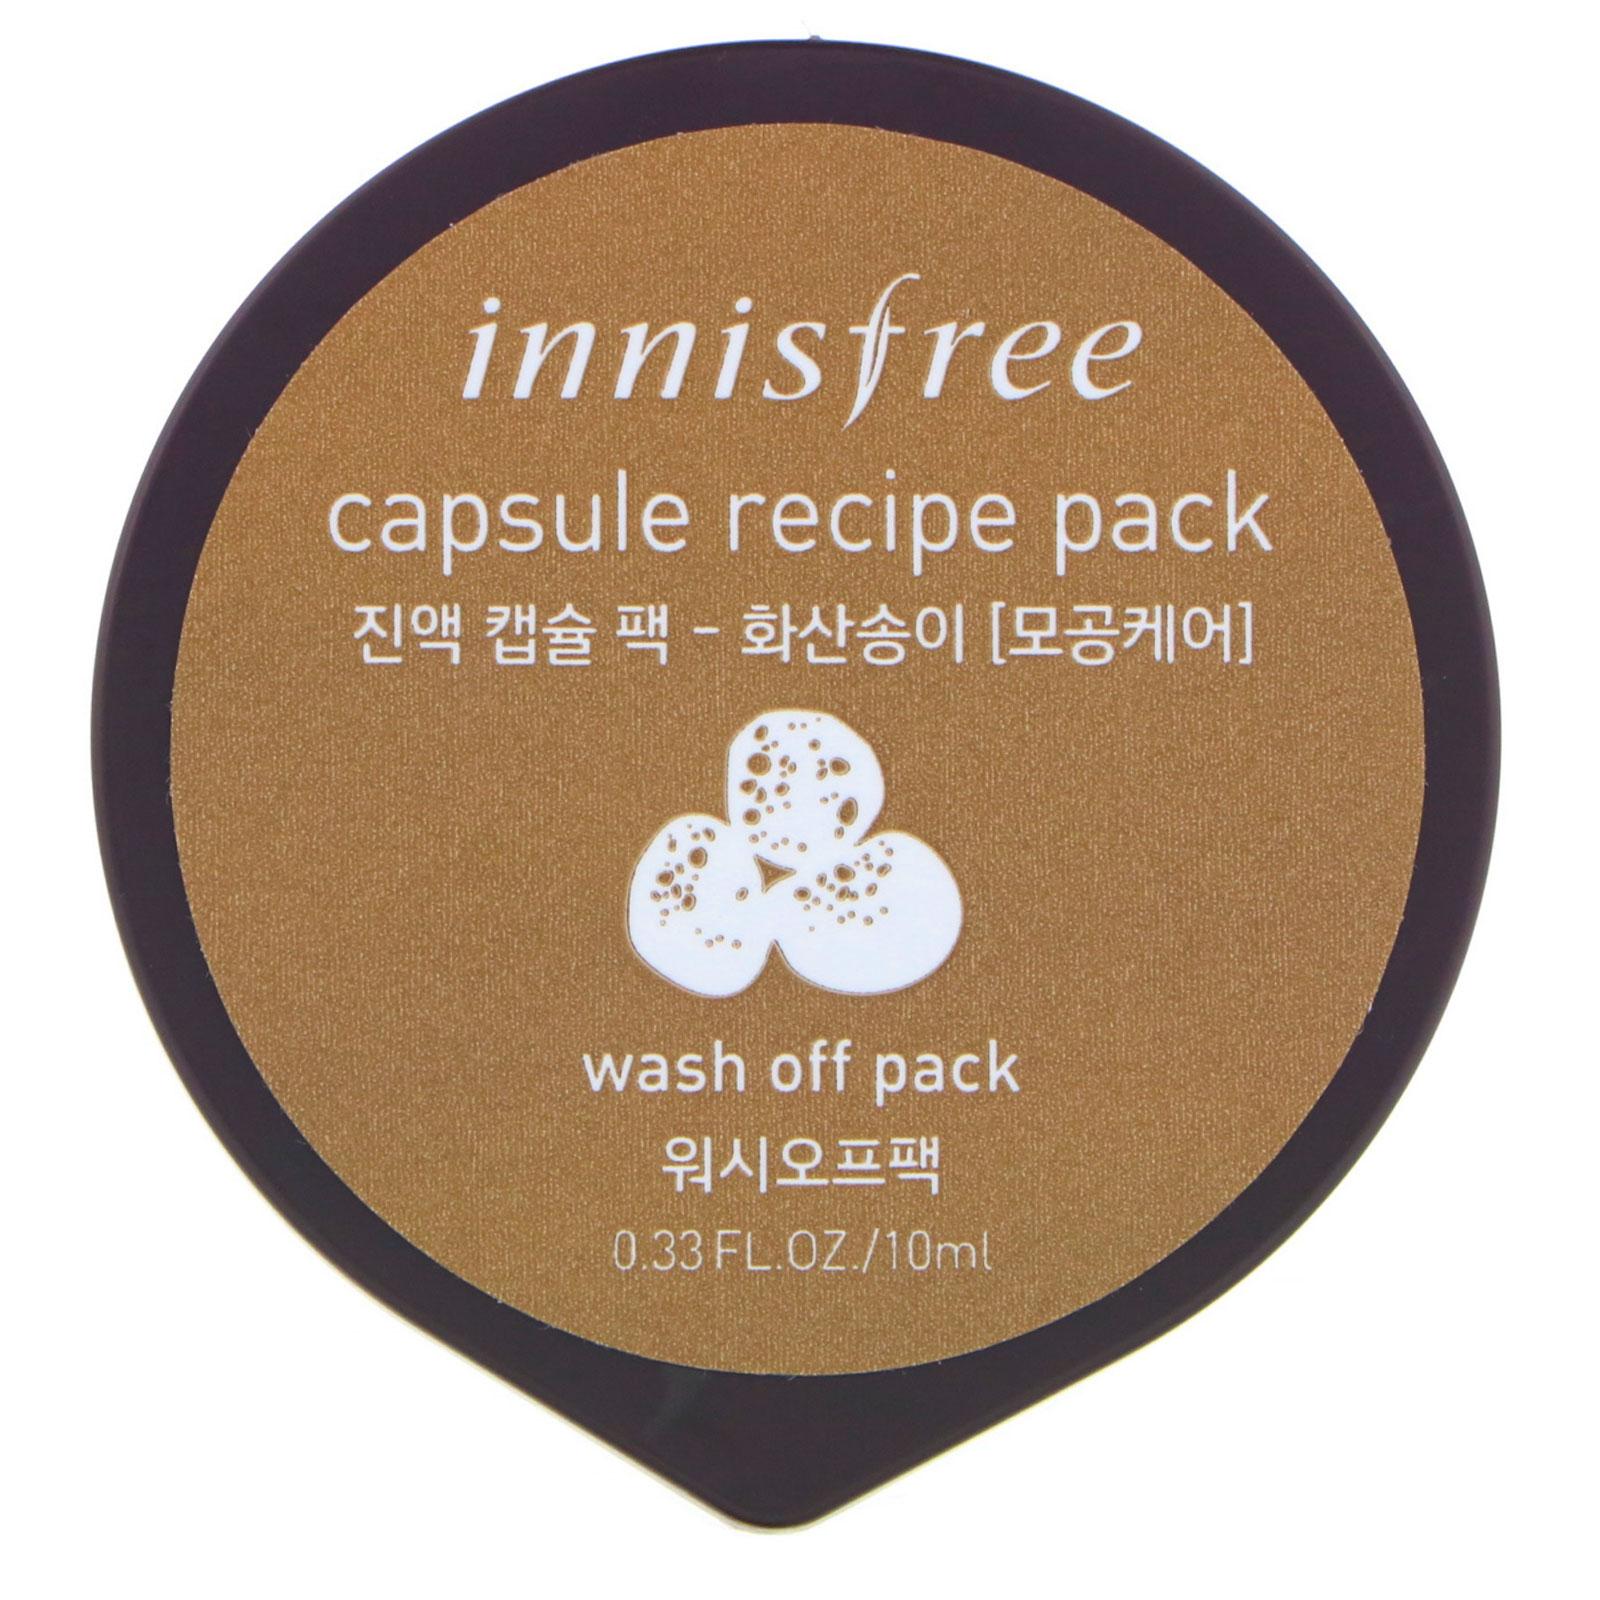 Innisfree, Capsule Recipe Pack, Volcanic Cluster, 0.33 fl oz (10 ml) - iHerb.com